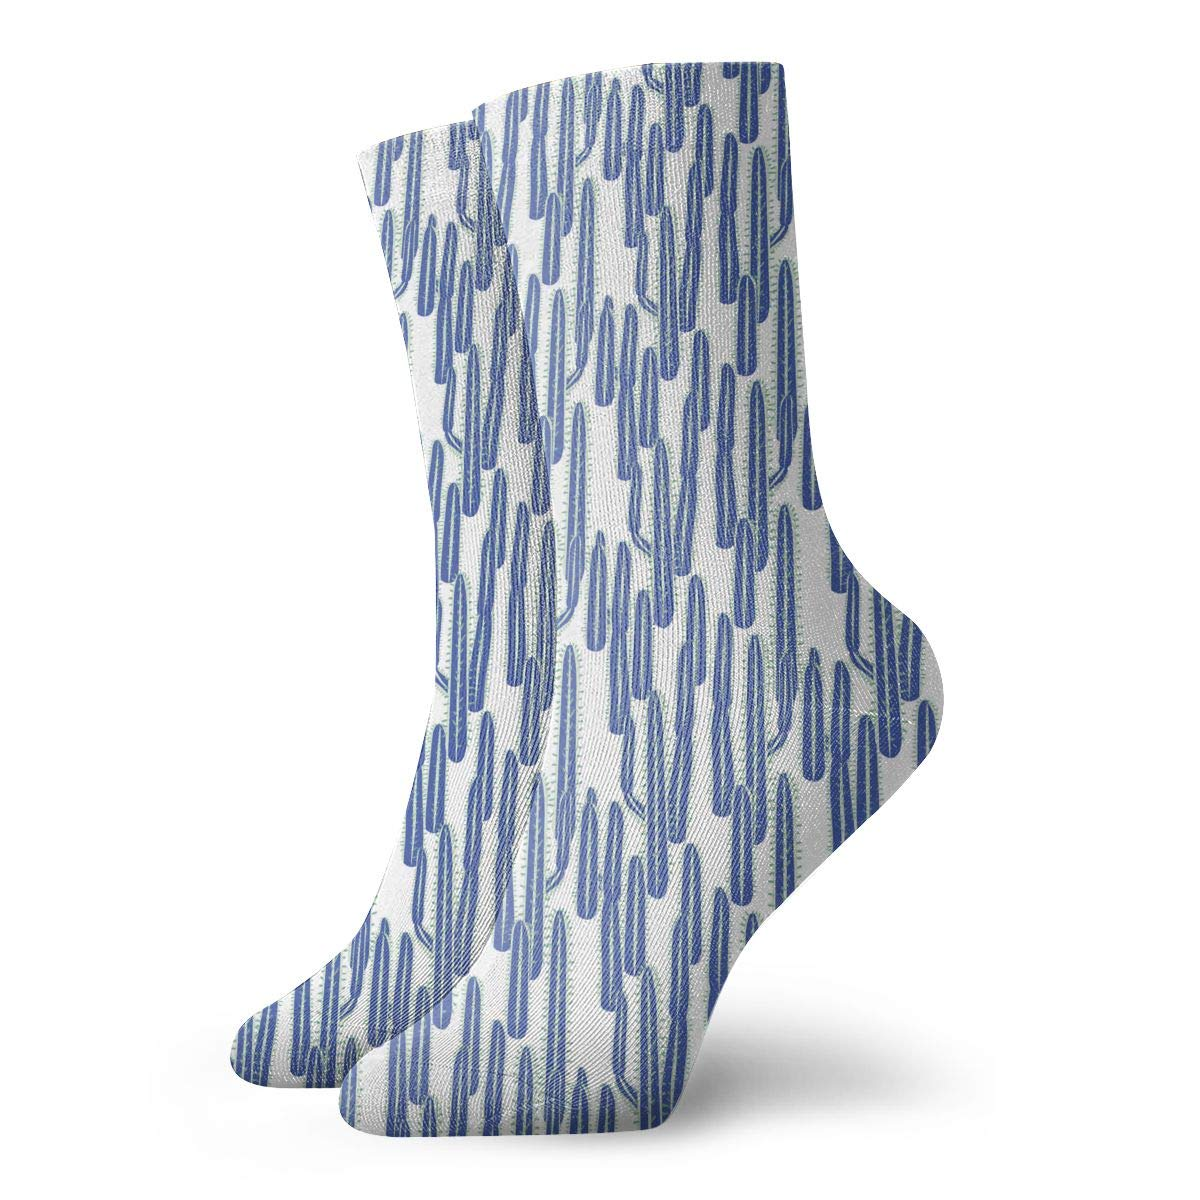 Unisex Cactus Long Blue Plant Athletic Quarter Ankle Print Breathable Hiking Running Socks